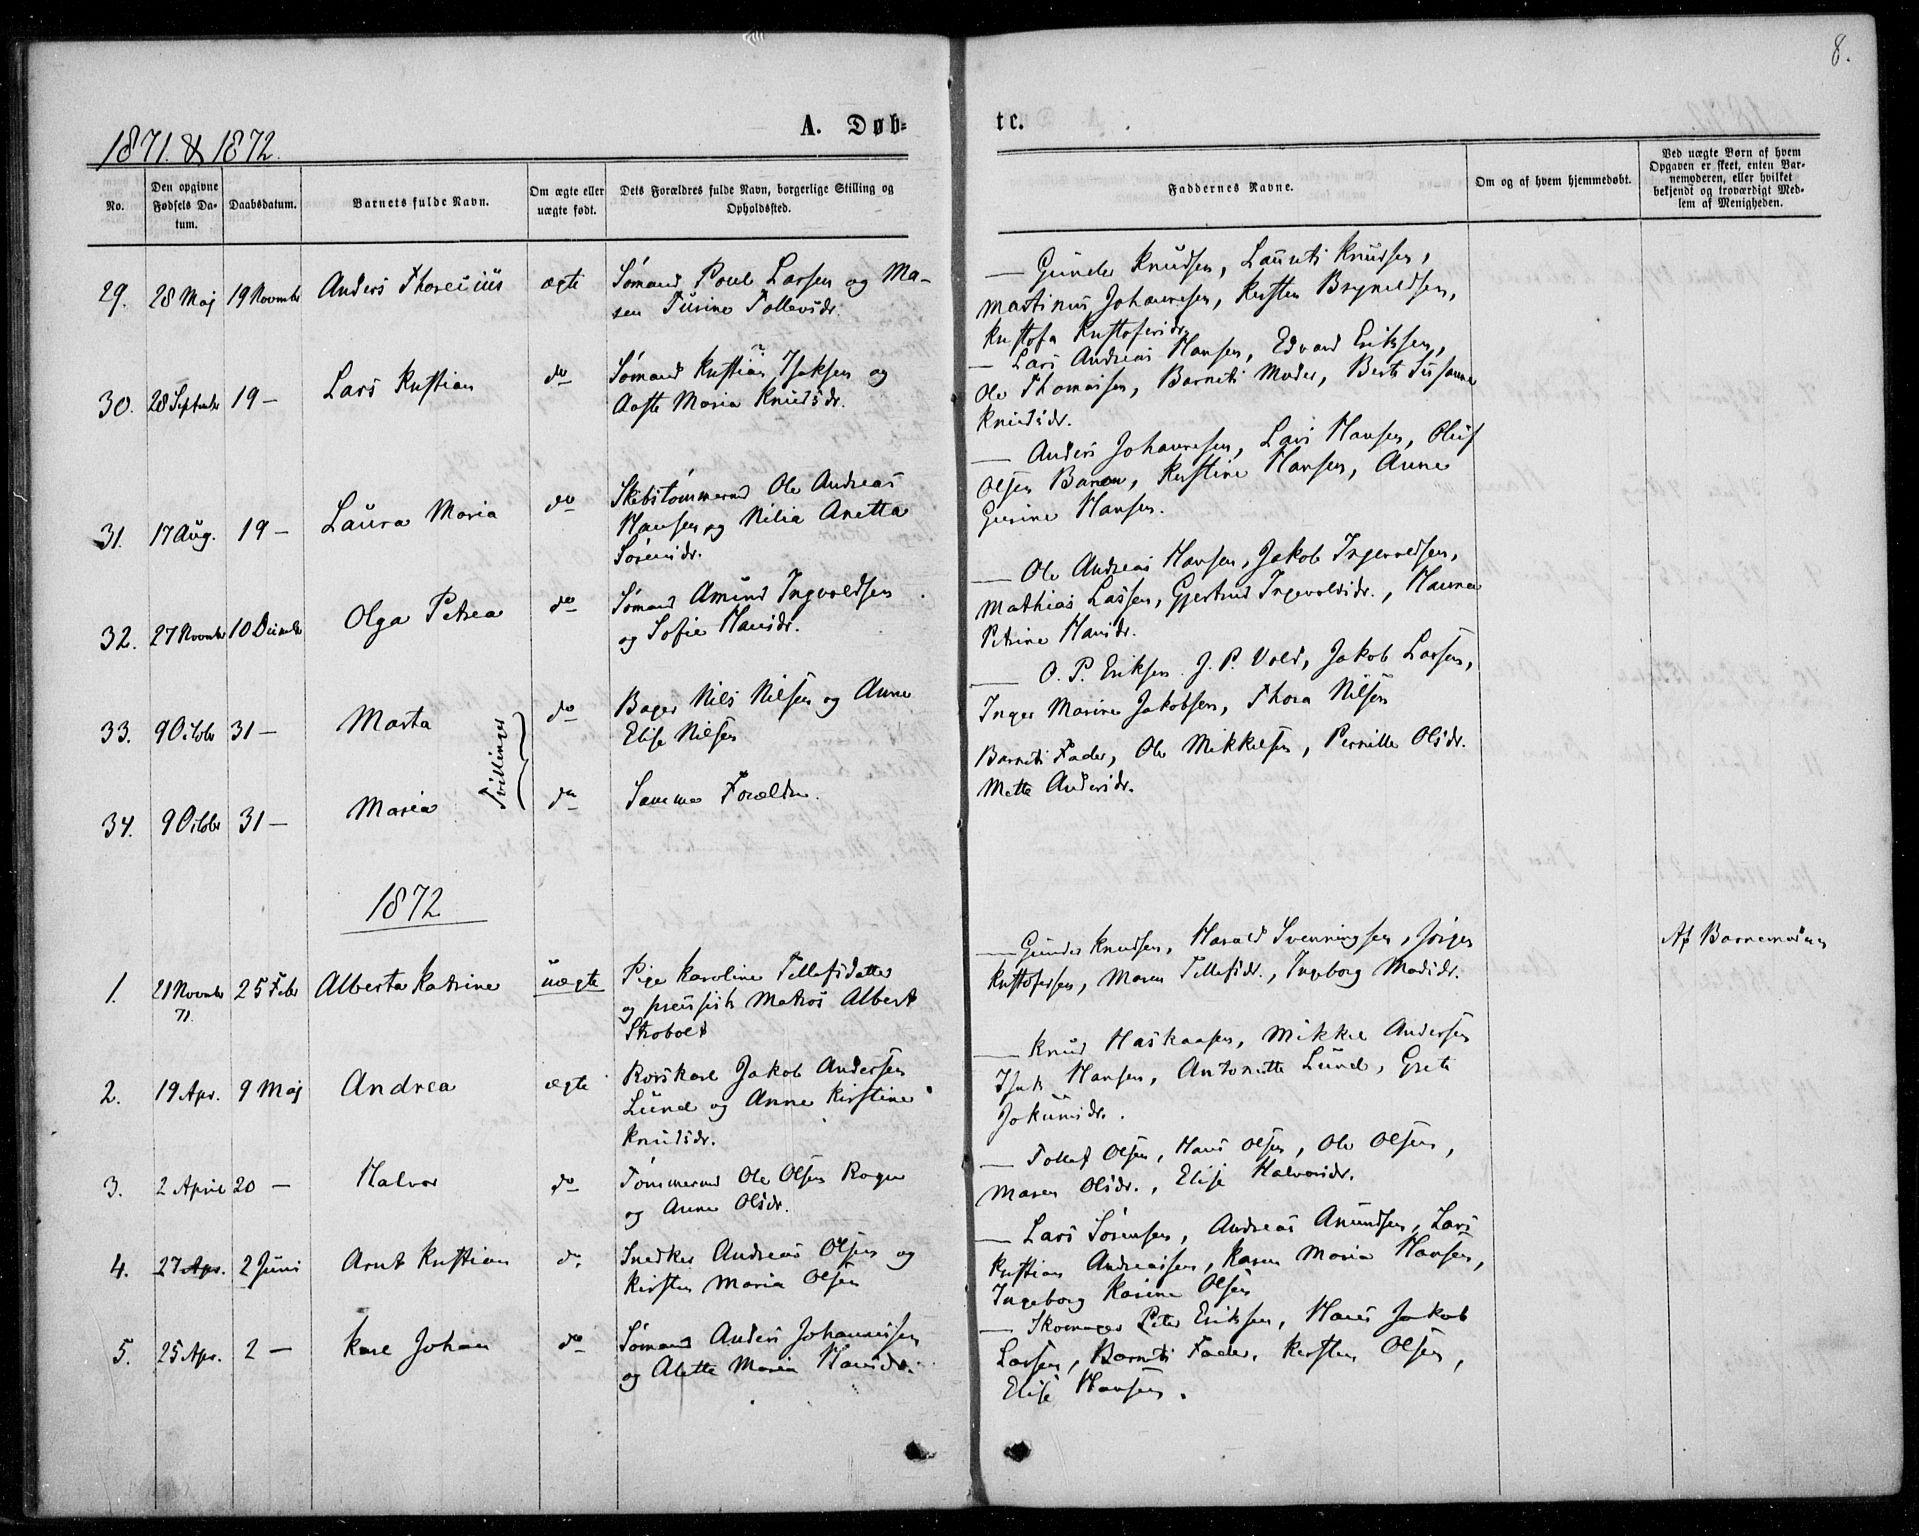 SAKO, Langesund kirkebøker, F/Fa/L0001: Ministerialbok nr. 1, 1870-1877, s. 8